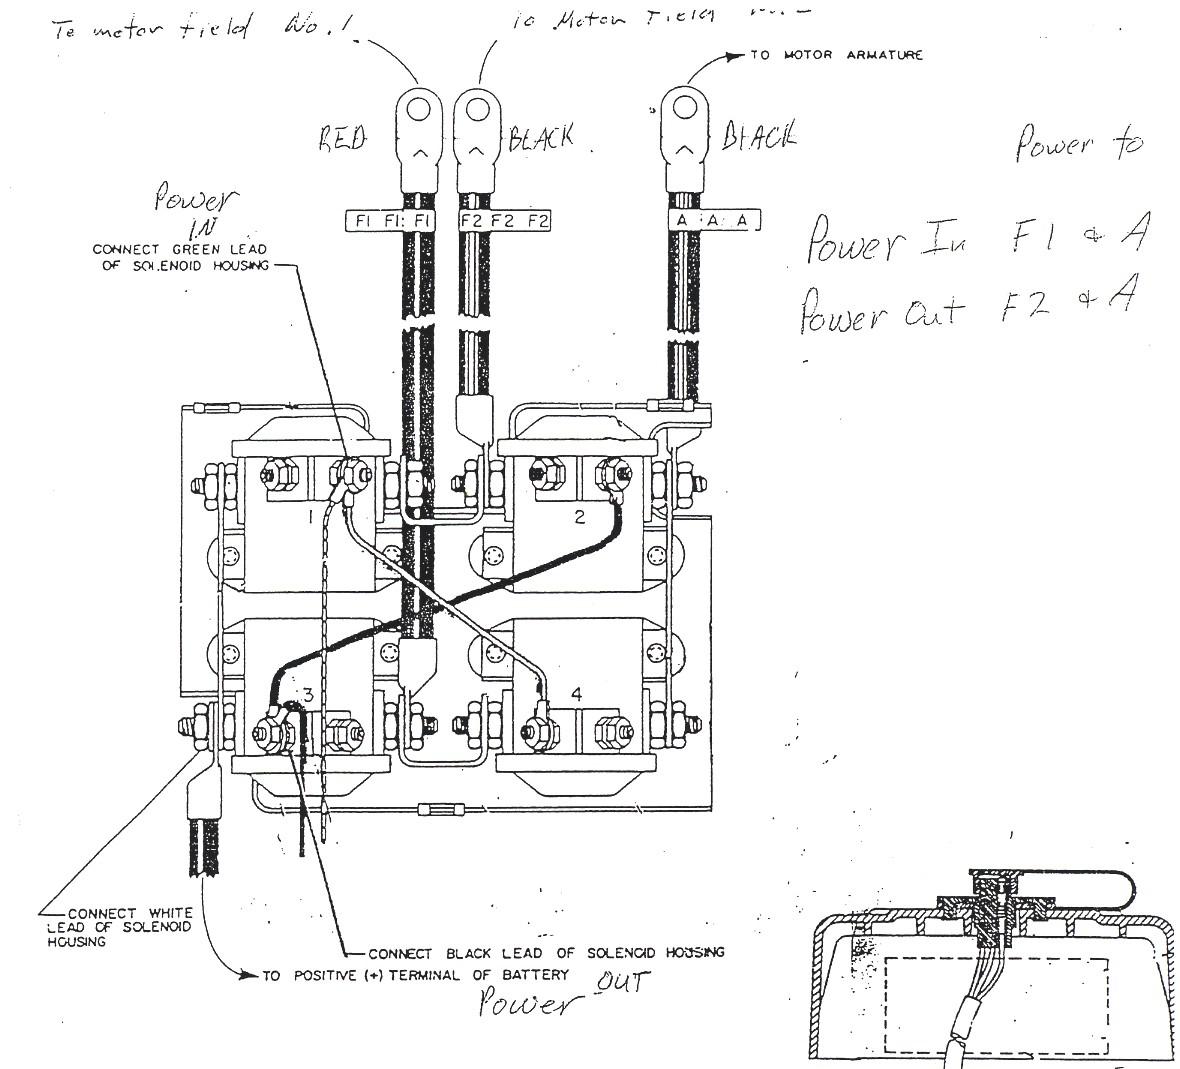 Warn Winch Solenoid Wiring - Wiring Diagrams Hubs - Warn Winch Wiring Diagram 4 Solenoid